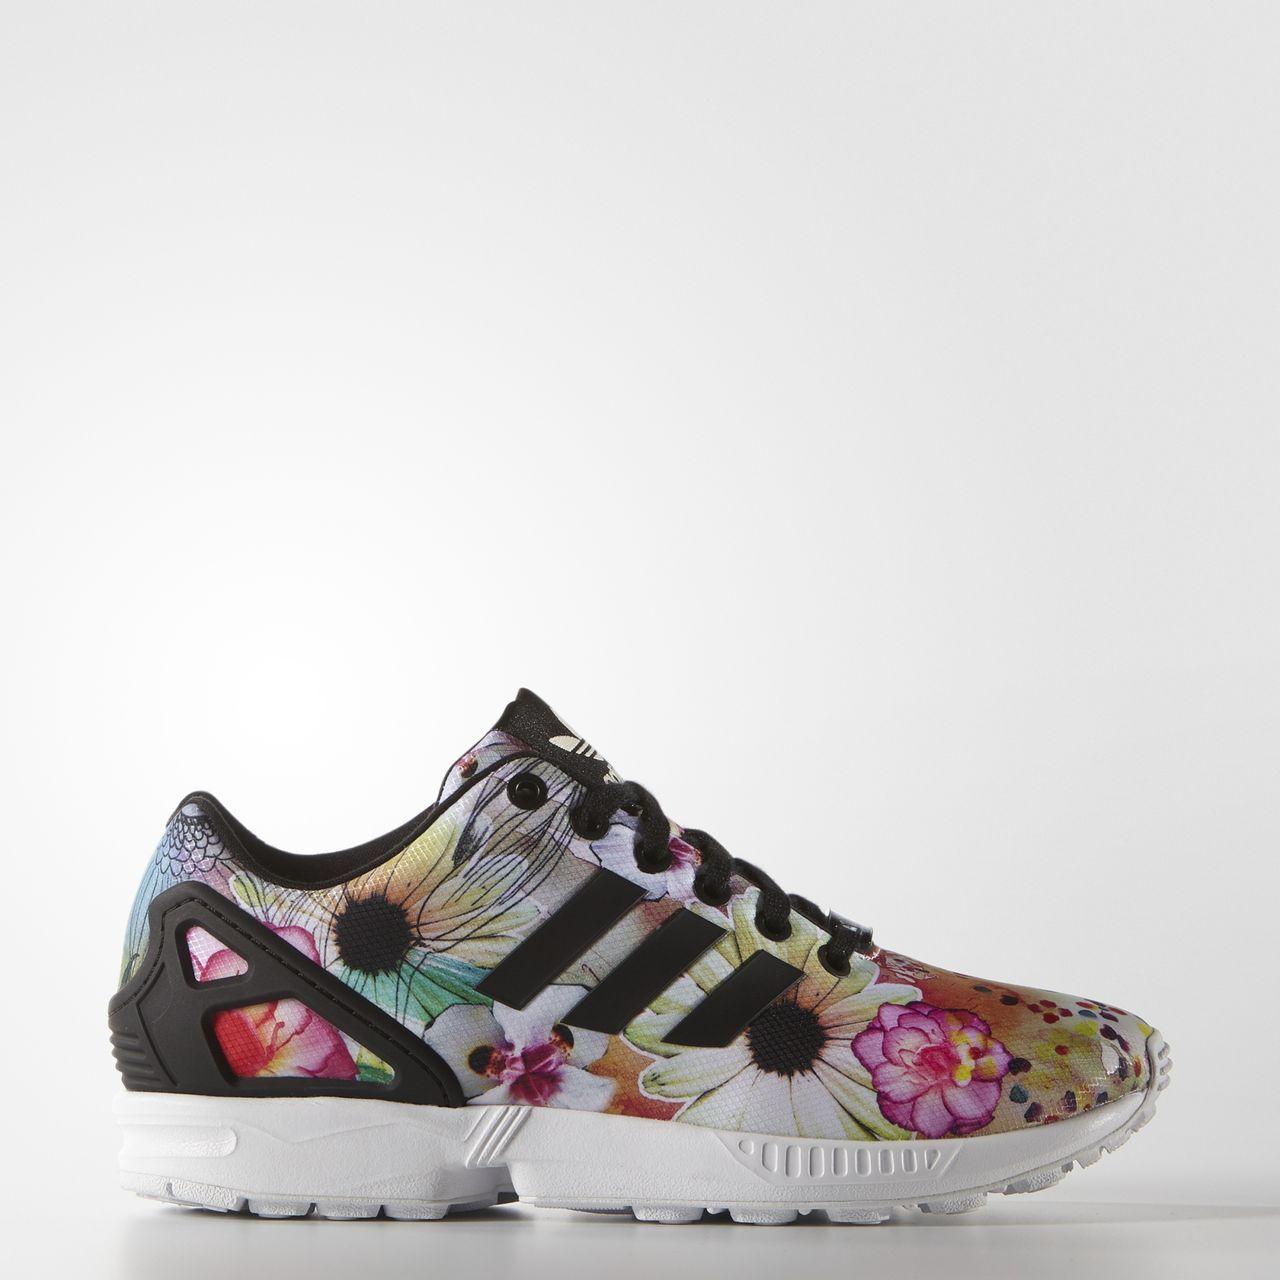 adidas zx flusso scarpe shoeporn pinterest adidas zx flusso scarpe